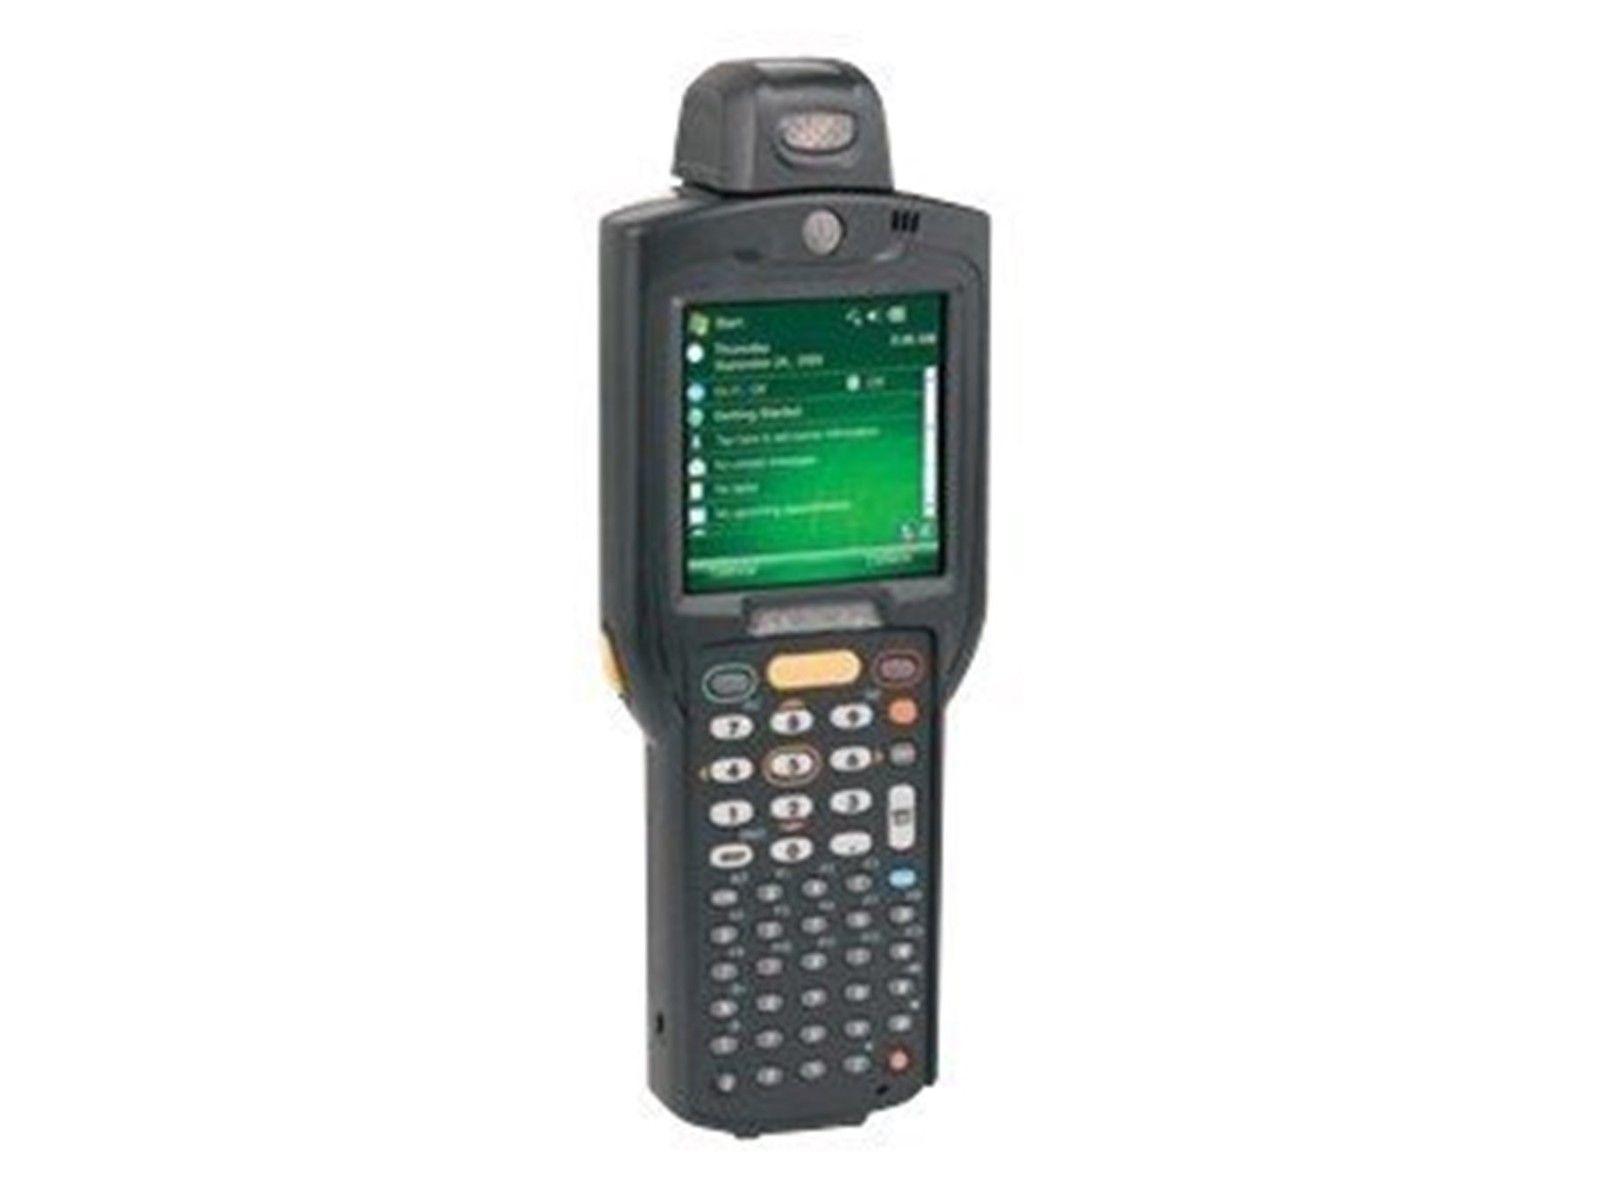 Motorola mc3190 s rugged 2d barcode scanner and 50 similar items biocorpaavc Gallery